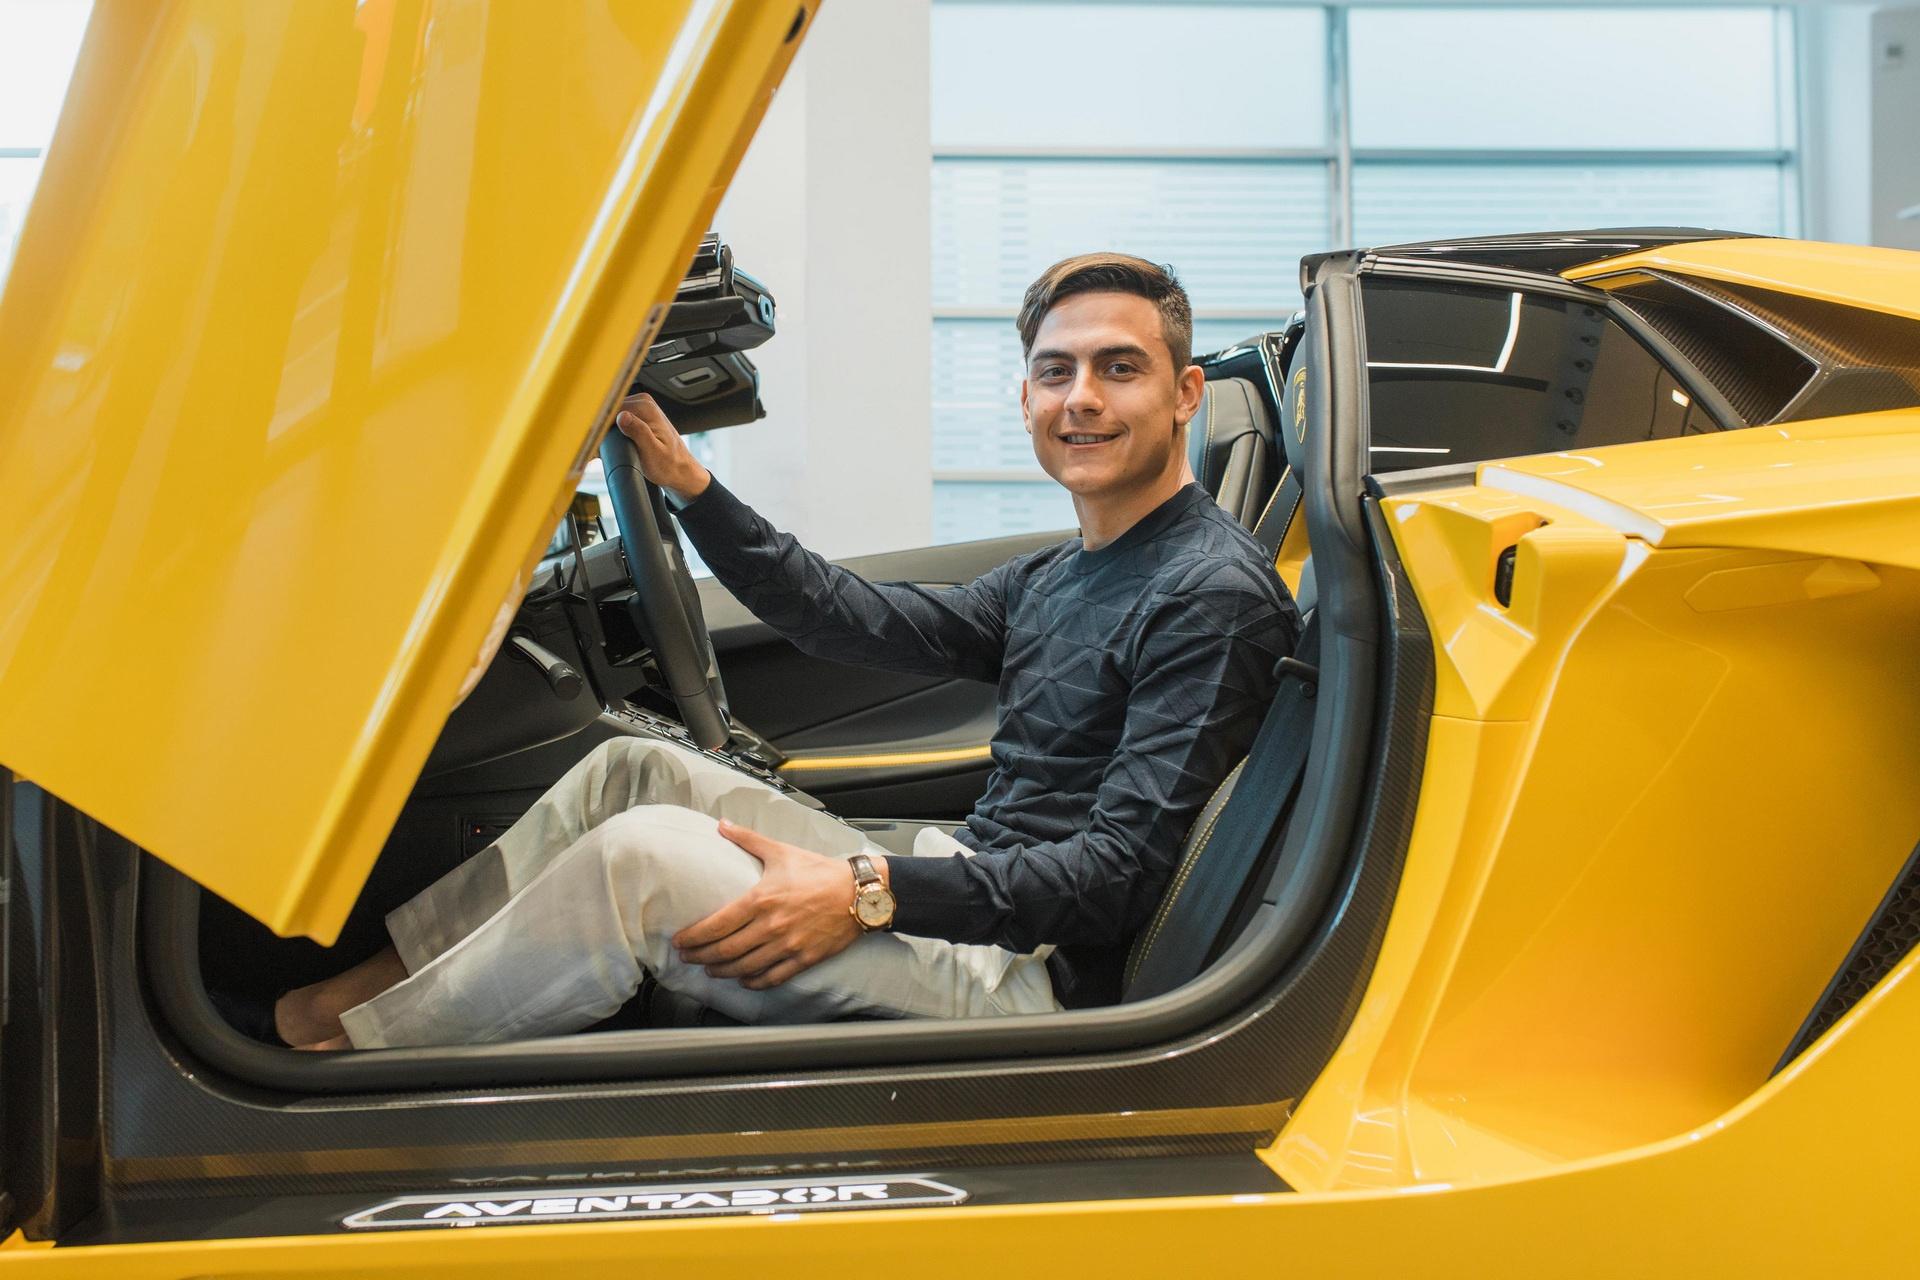 Chi tiết siêu xe Lamborghini Aventador S Roadster của Paulo Dybala - Ảnh 5.